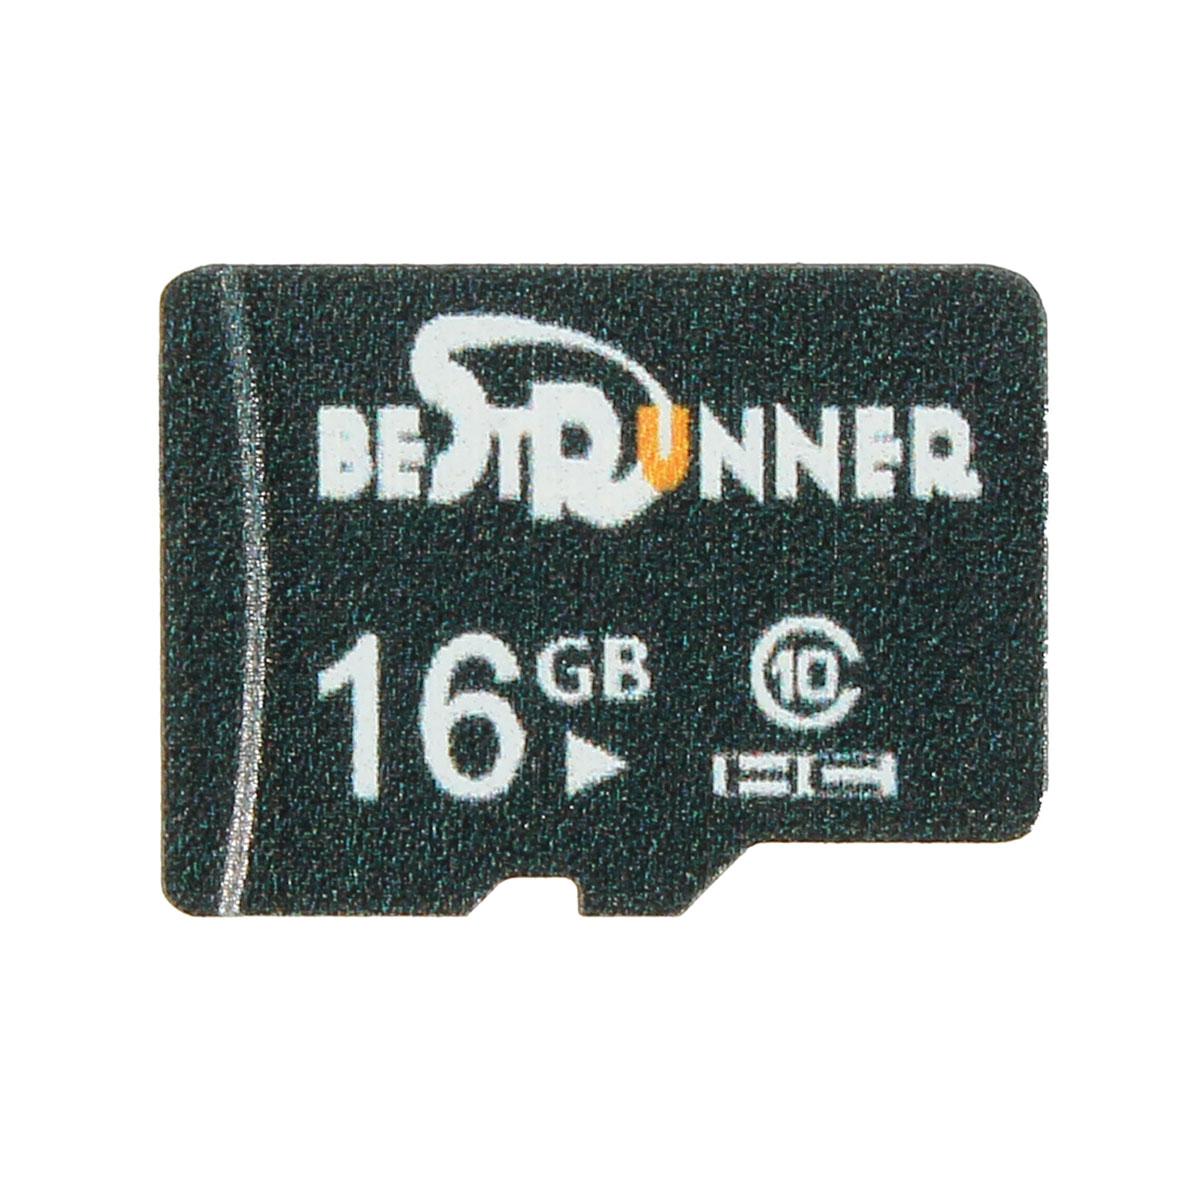 Wholesale Hot Sale Memory Cards Micro SD SDHC Card 16GB Class 10 Microsd Transflash TF Card Pen Drive Flash(China (Mainland))